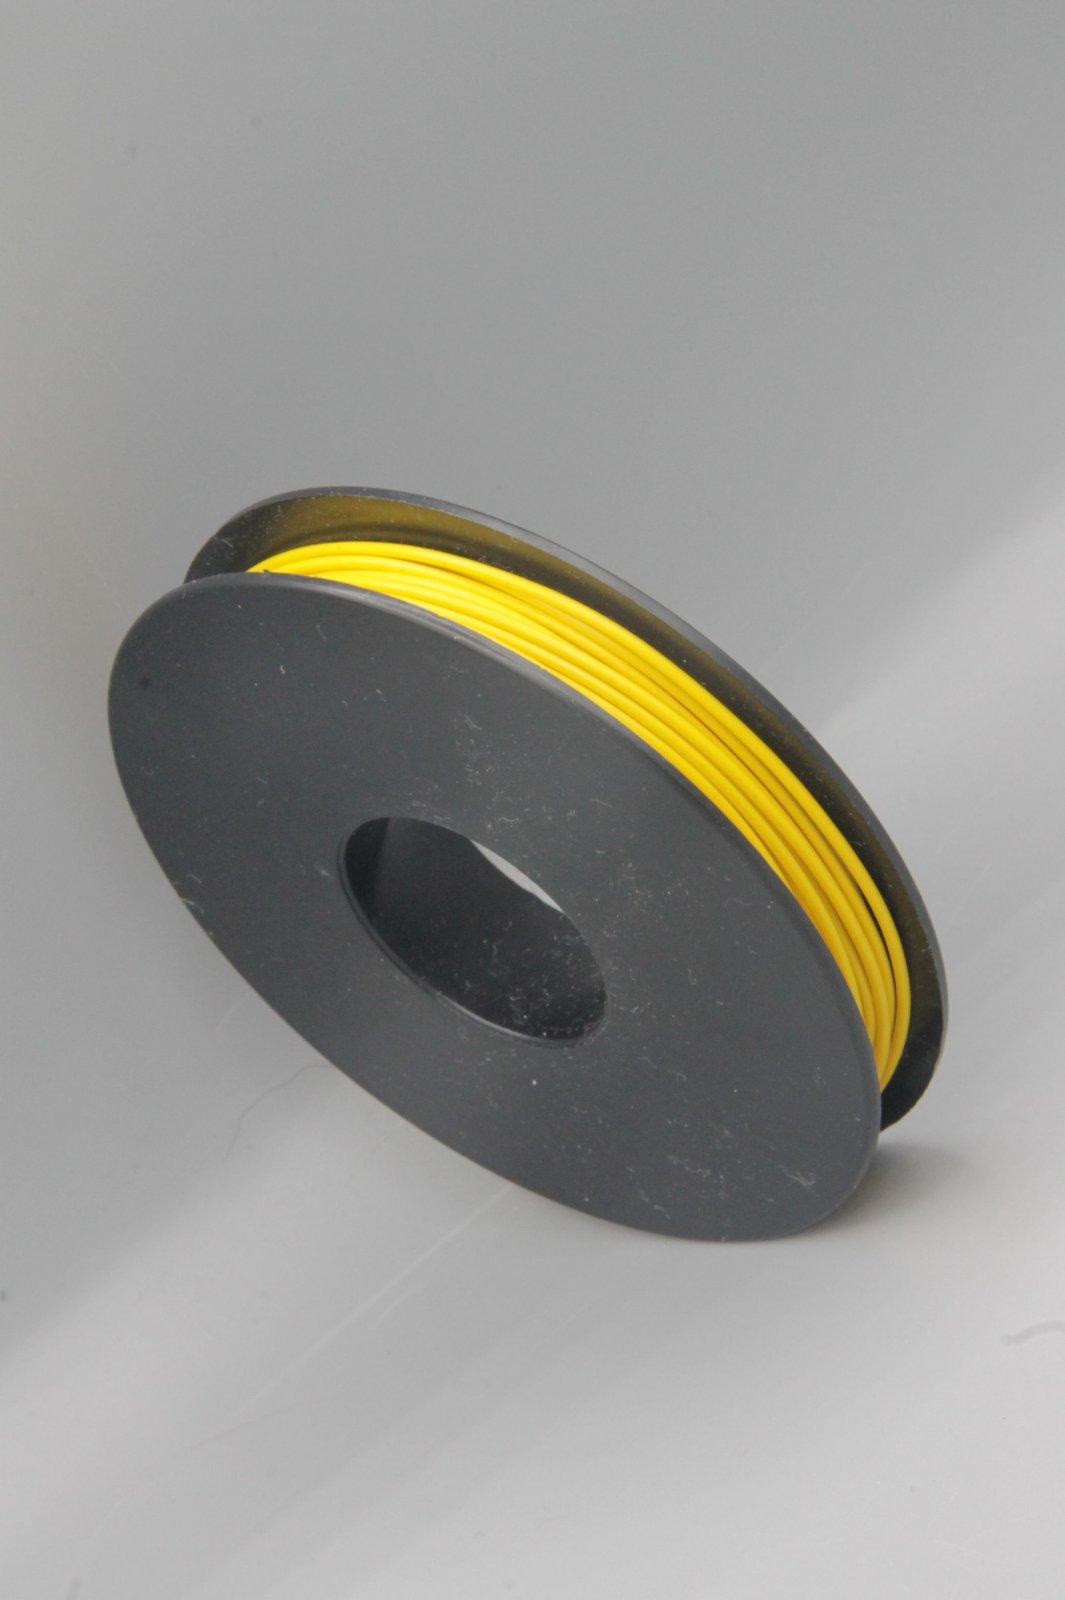 25 m Spule LIYV Kabel Litze flexibel  gelb 0,25 mm² Kupferlitze Kabel